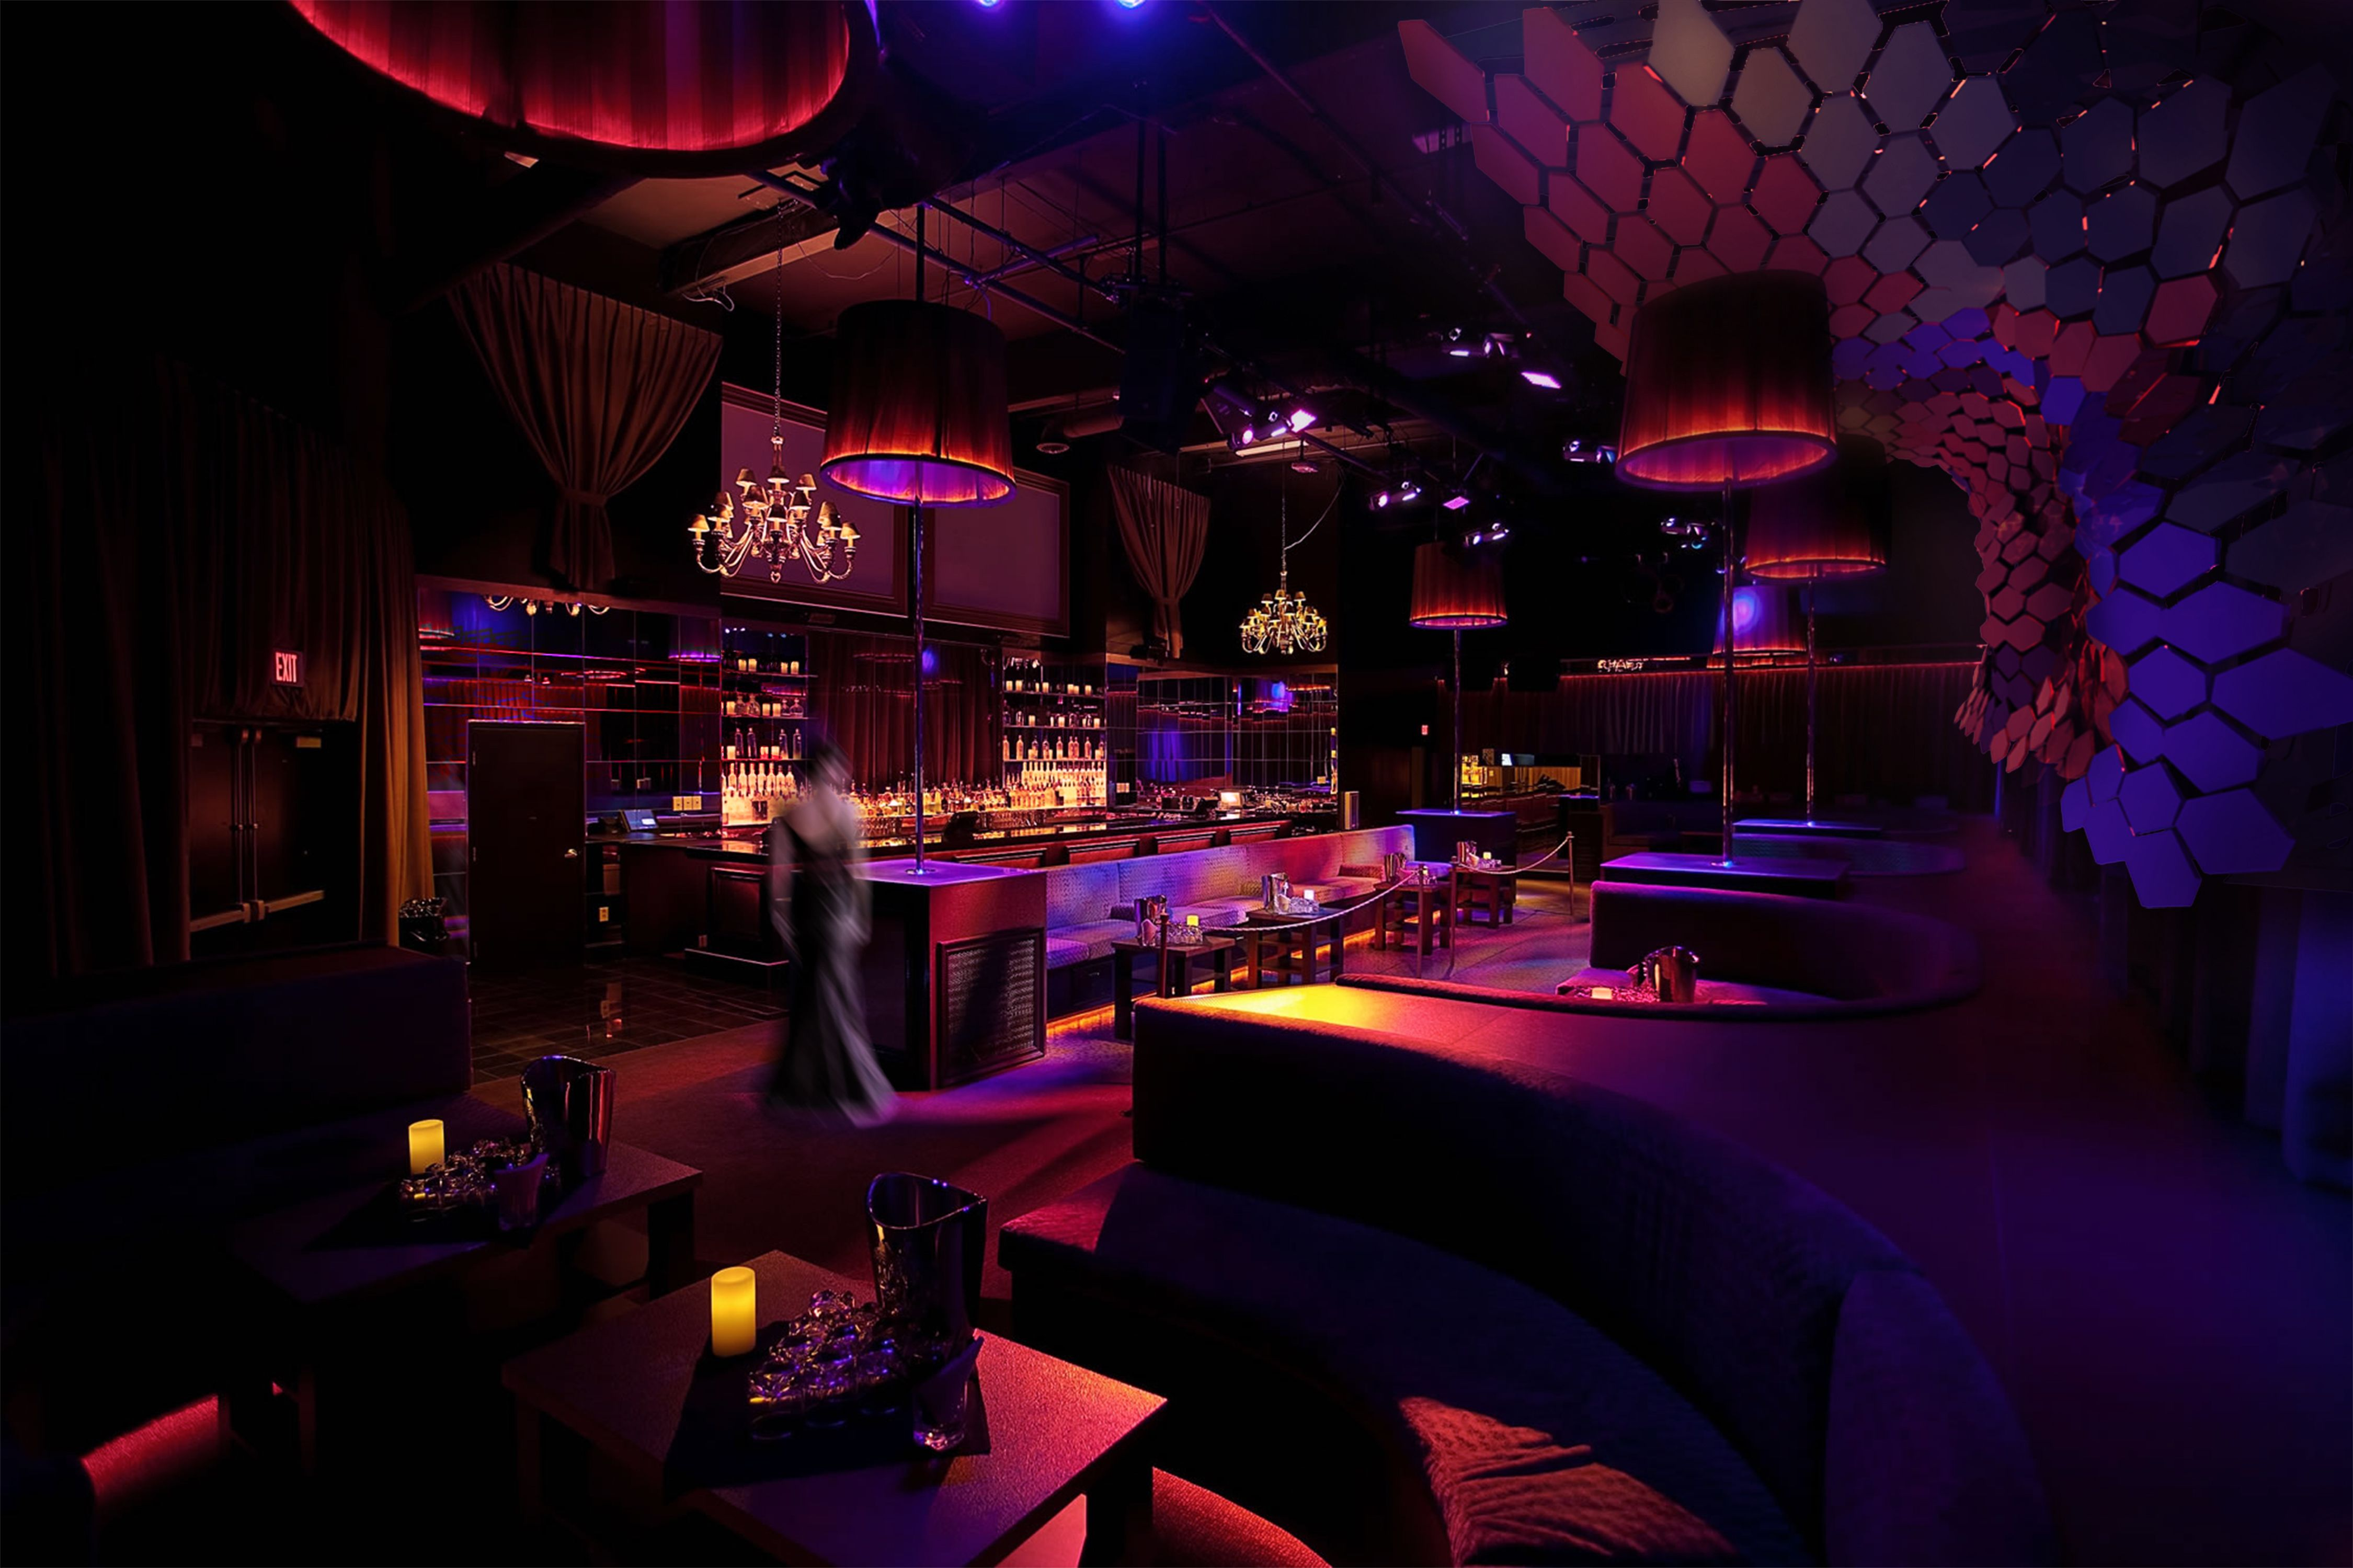 Mamba Vipera with acrylic shown in a night club.